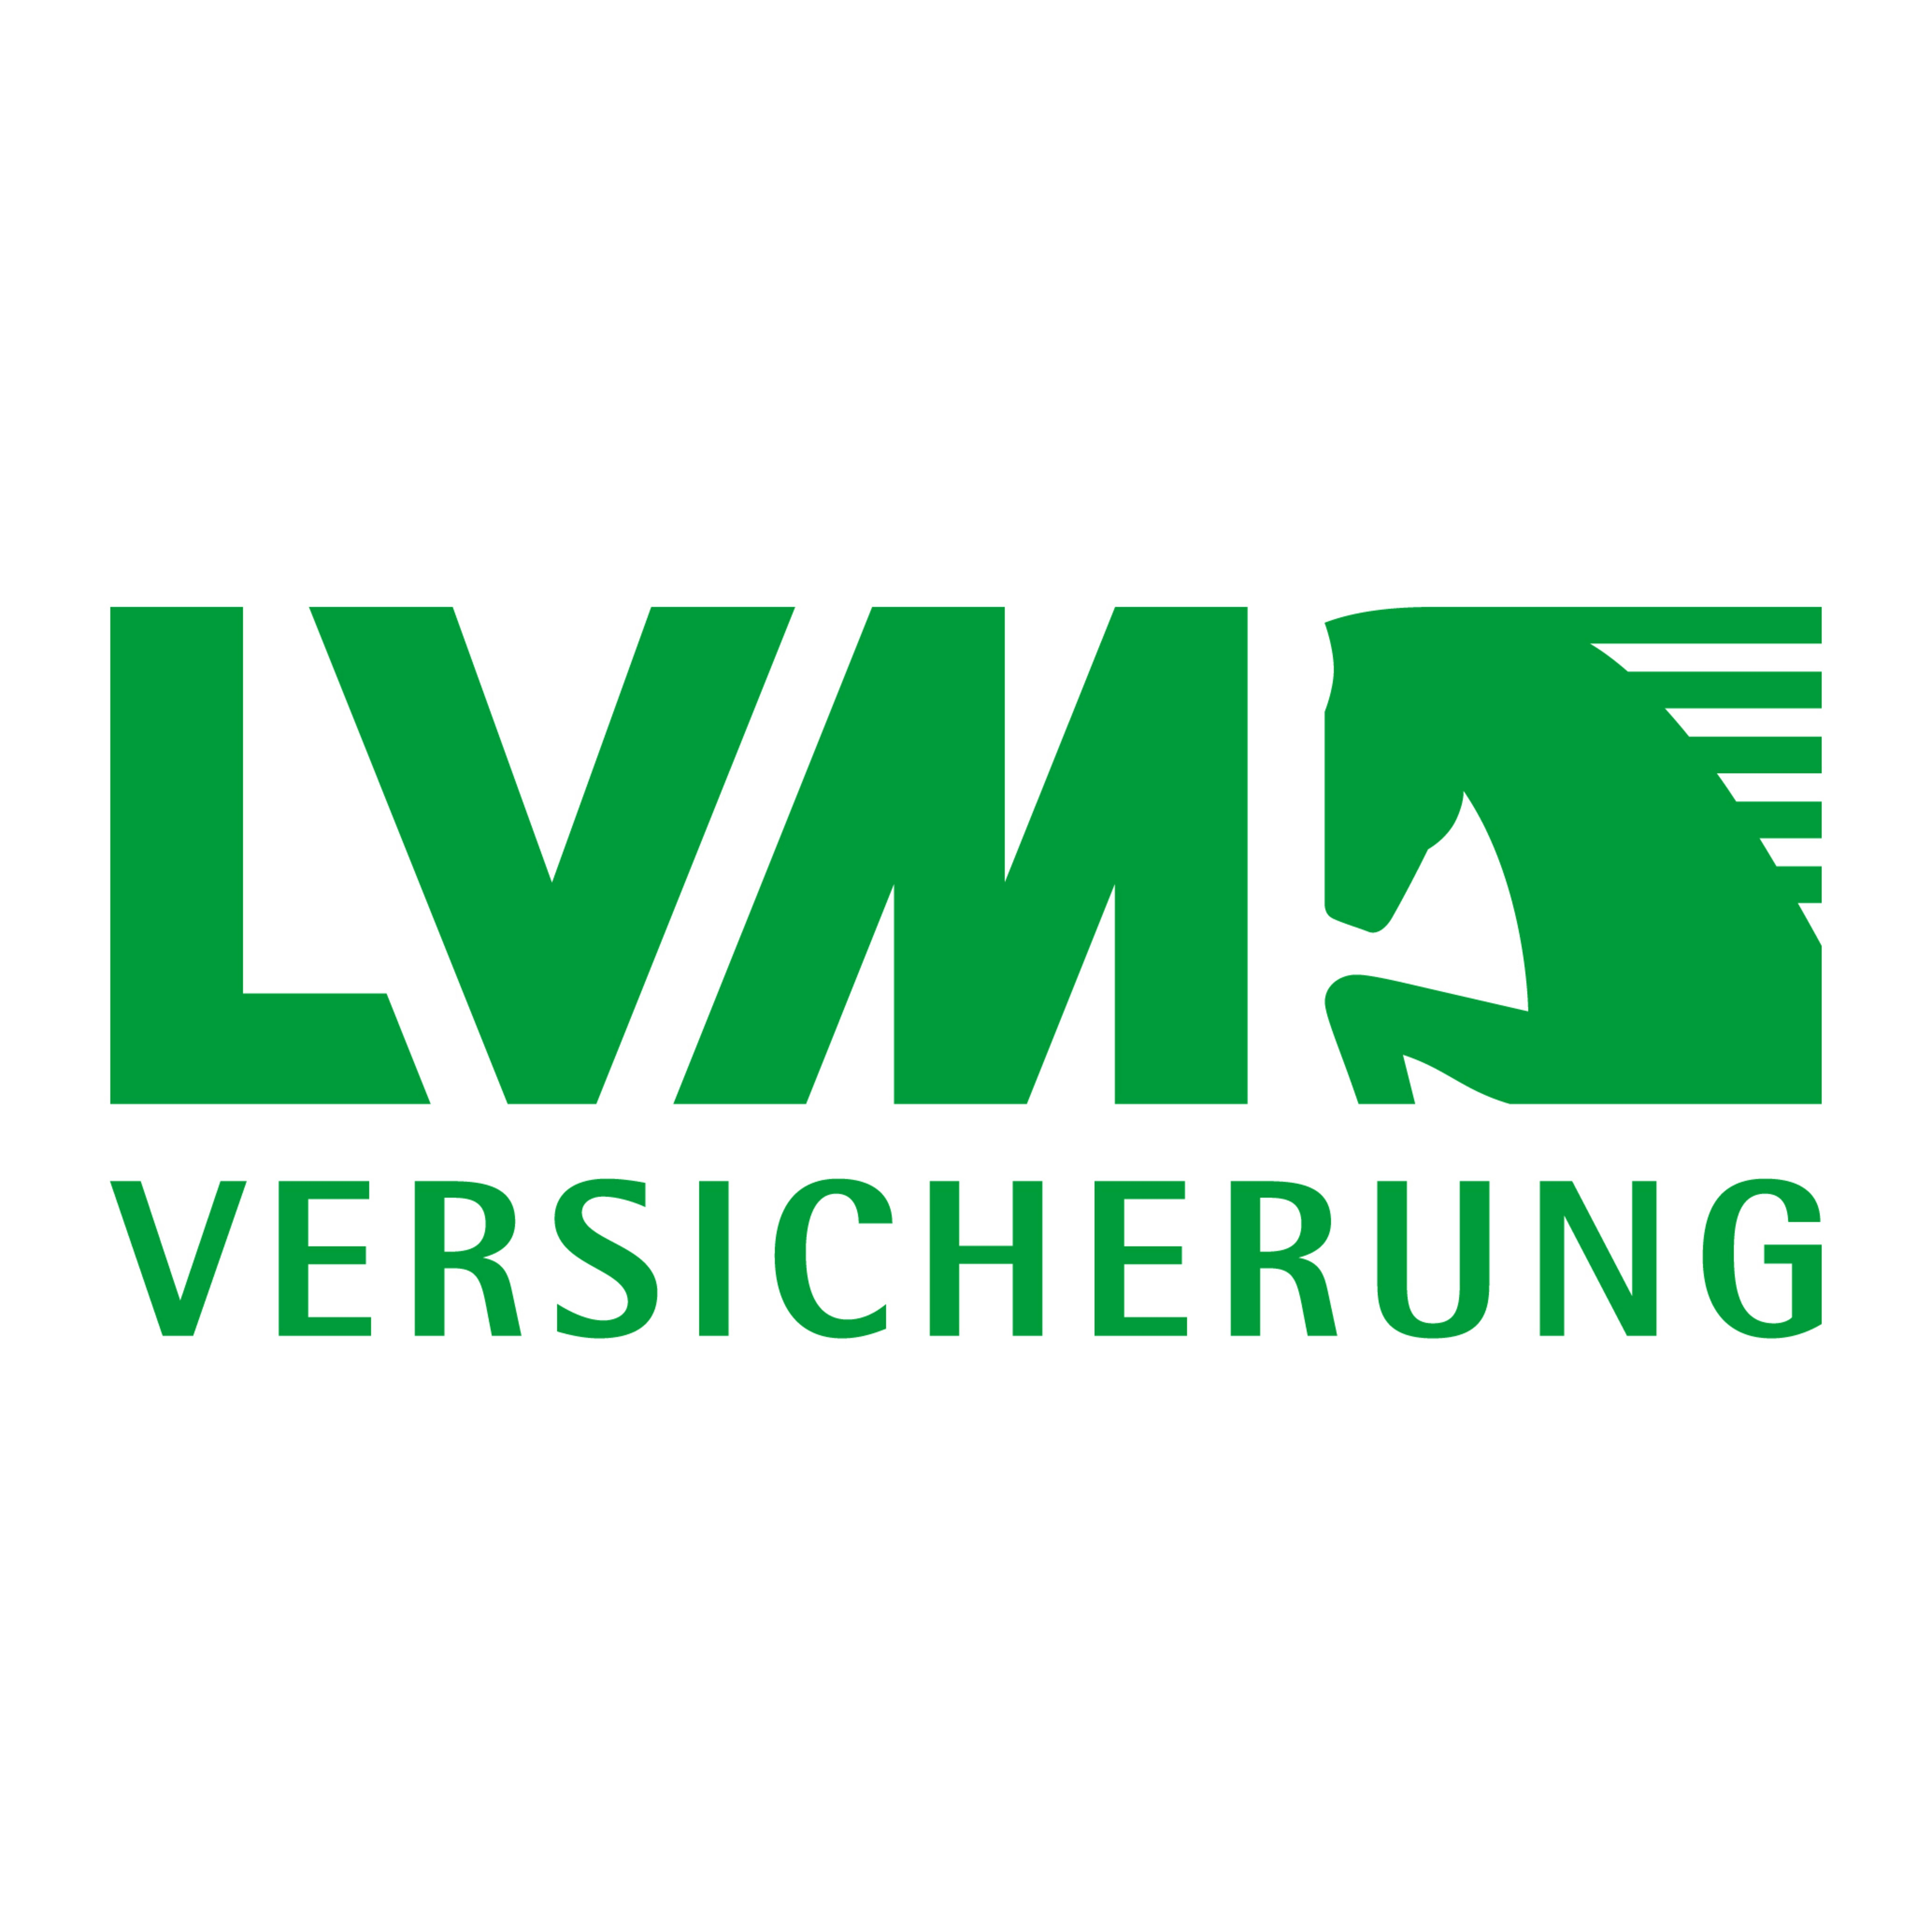 LVM Versicherung Martin Berg - Versicherungsagentur